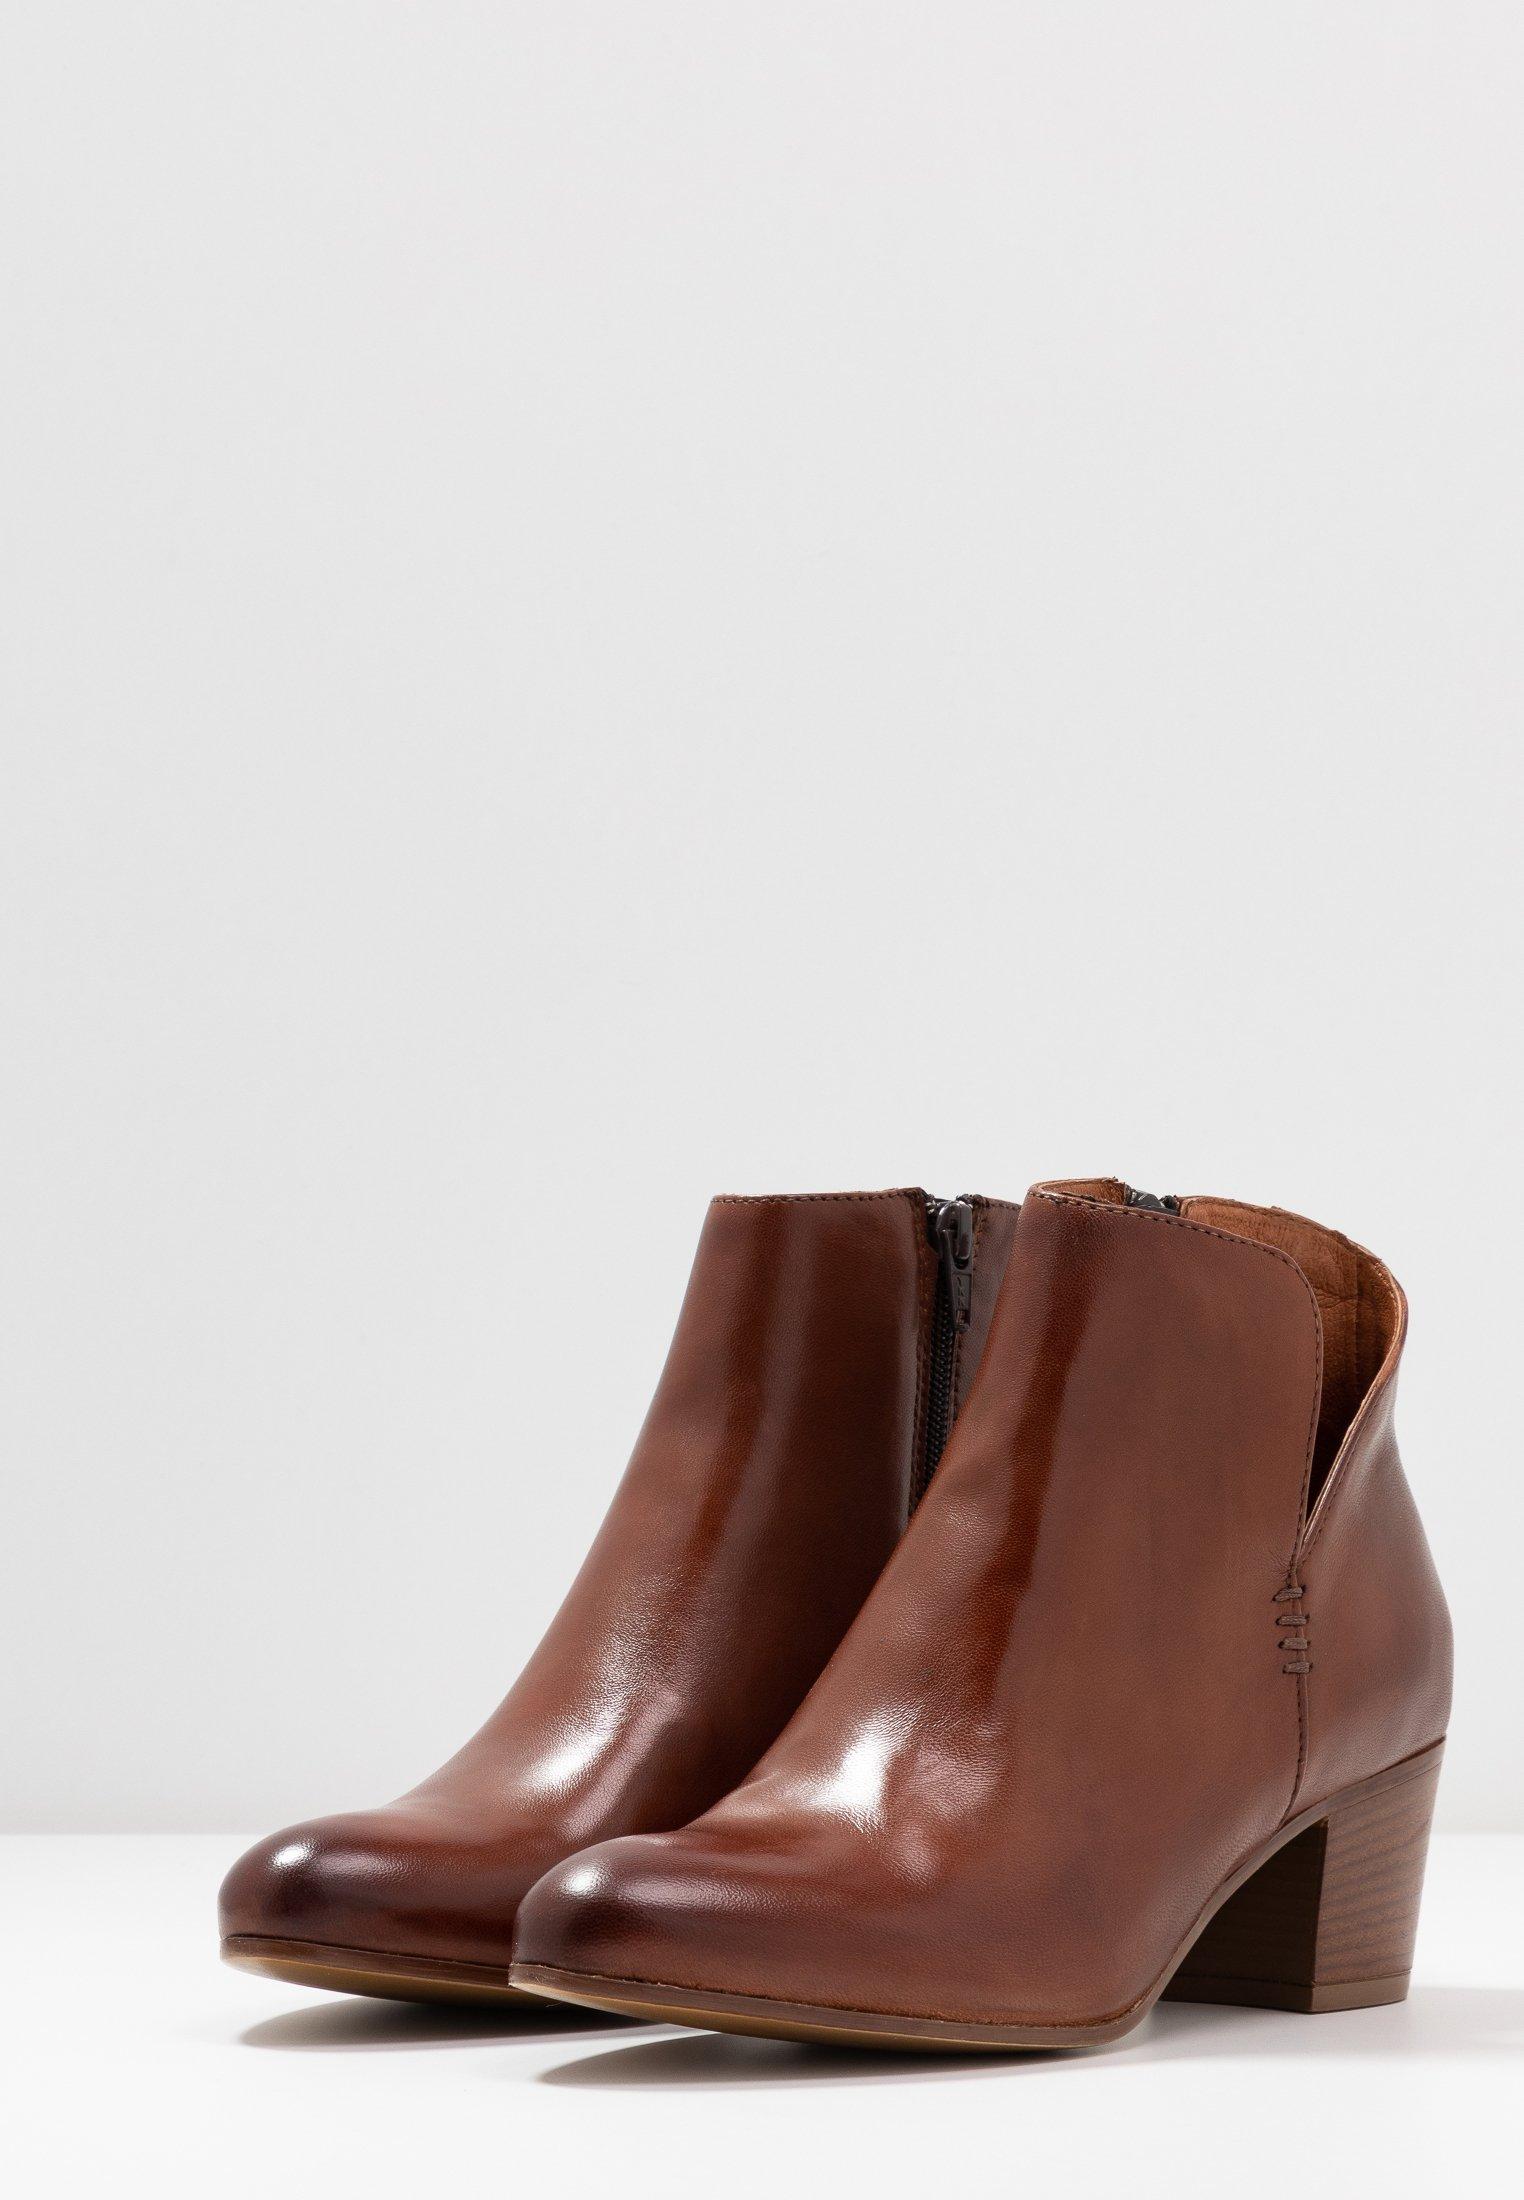 Anna Field Leather Booties - Ankelboots Cognac